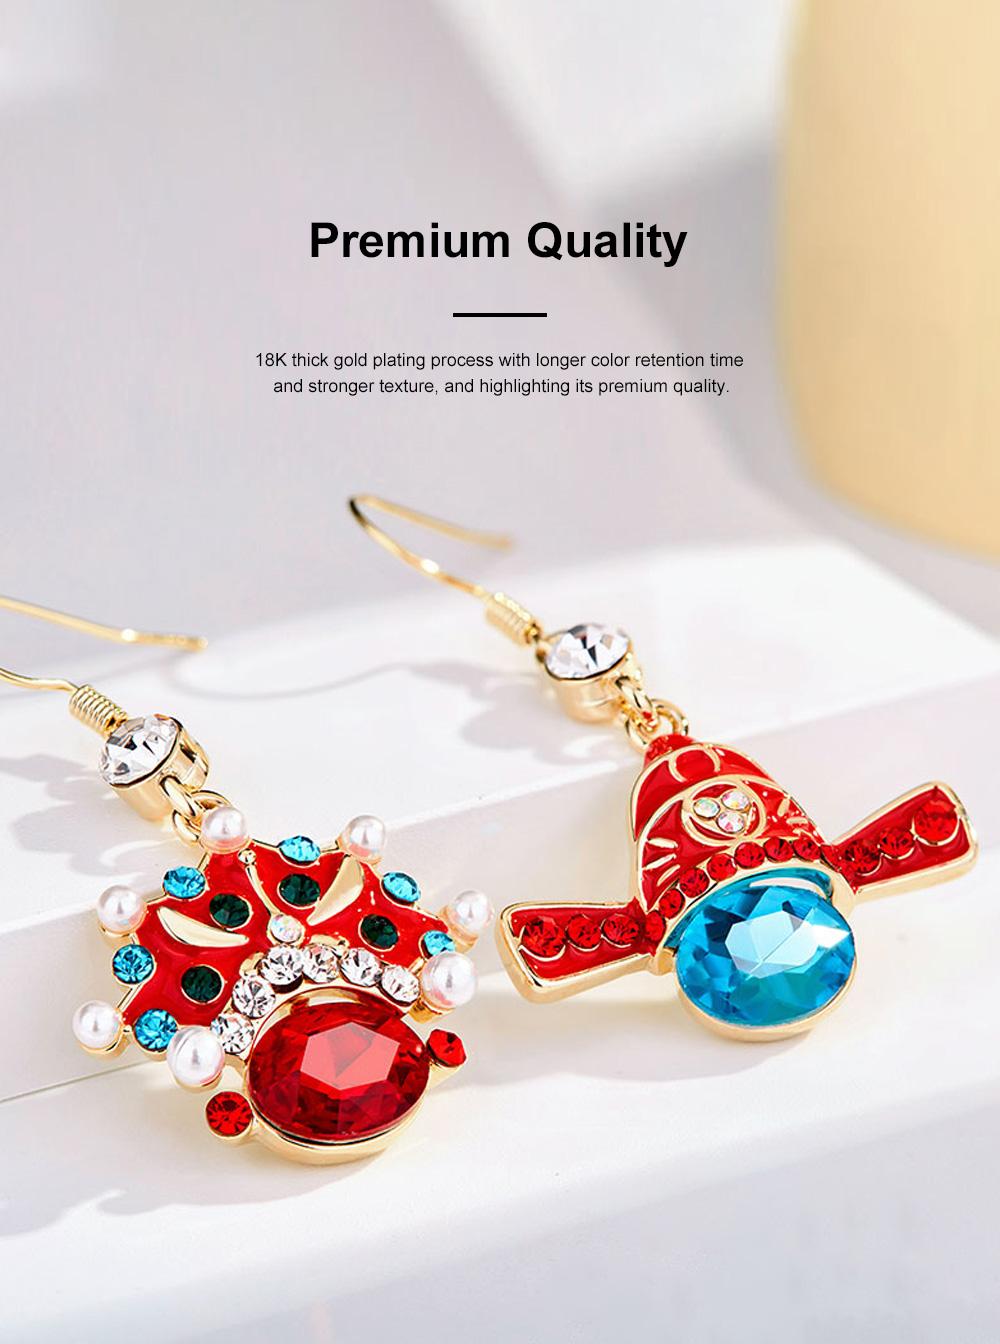 Chinese Style Dangle Earrings Asymmetric Personality Crystal Earrings Bride Groom Earrings Studs 2